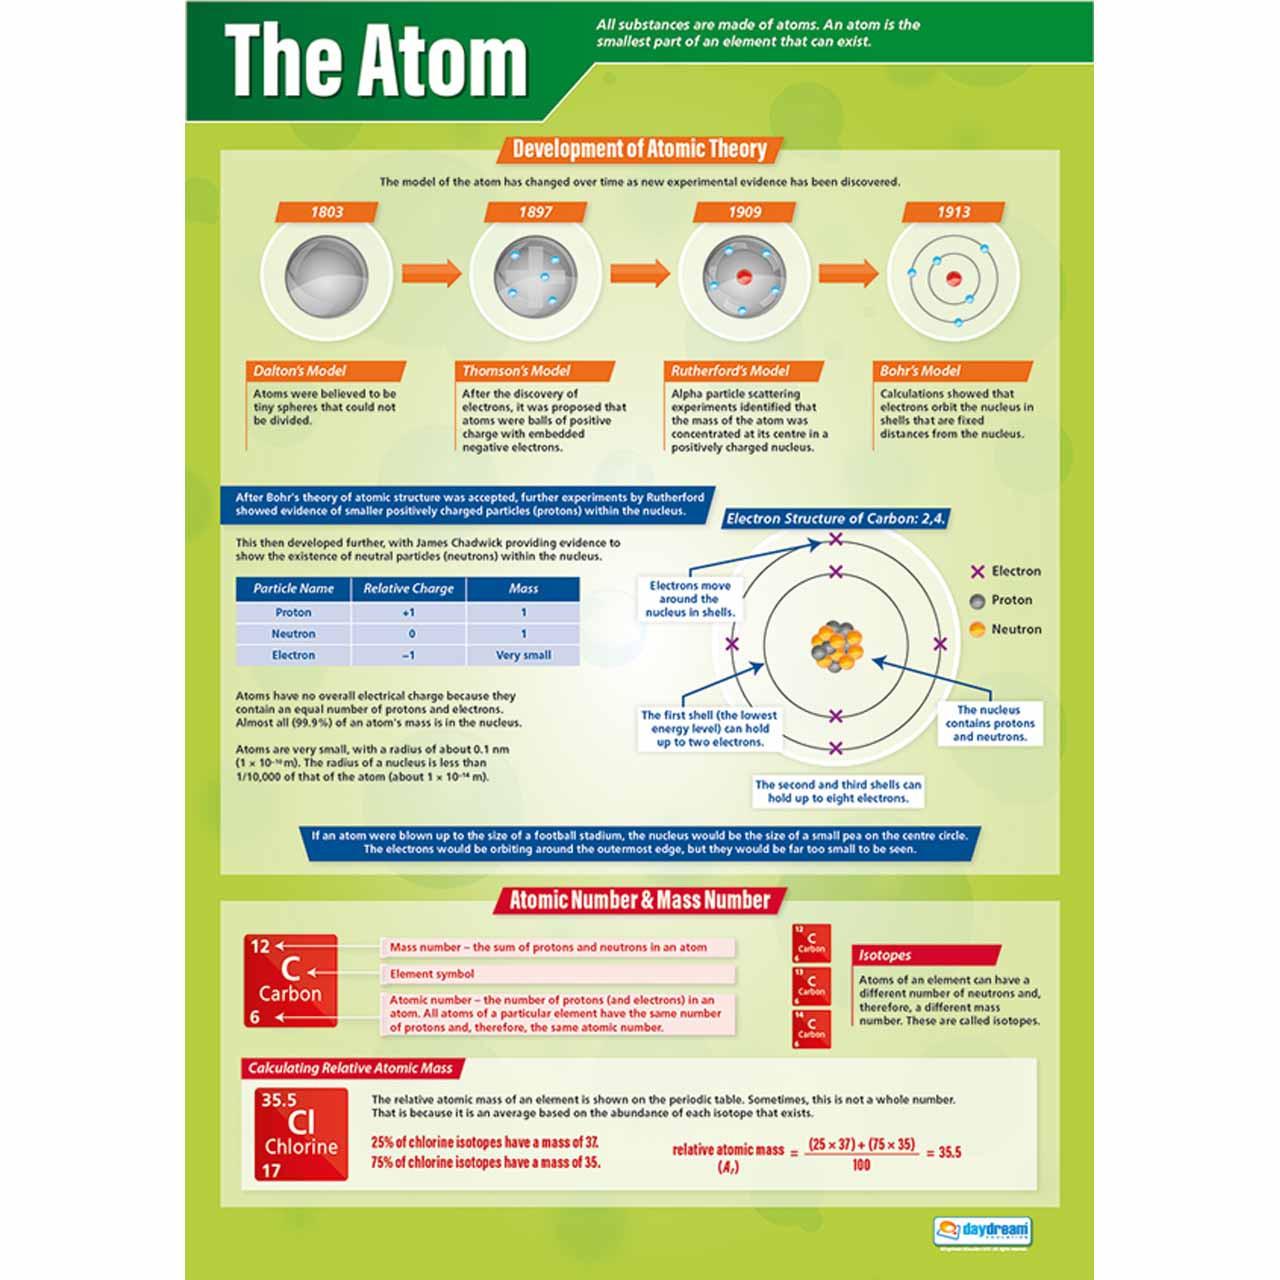 SC072L - The Atom